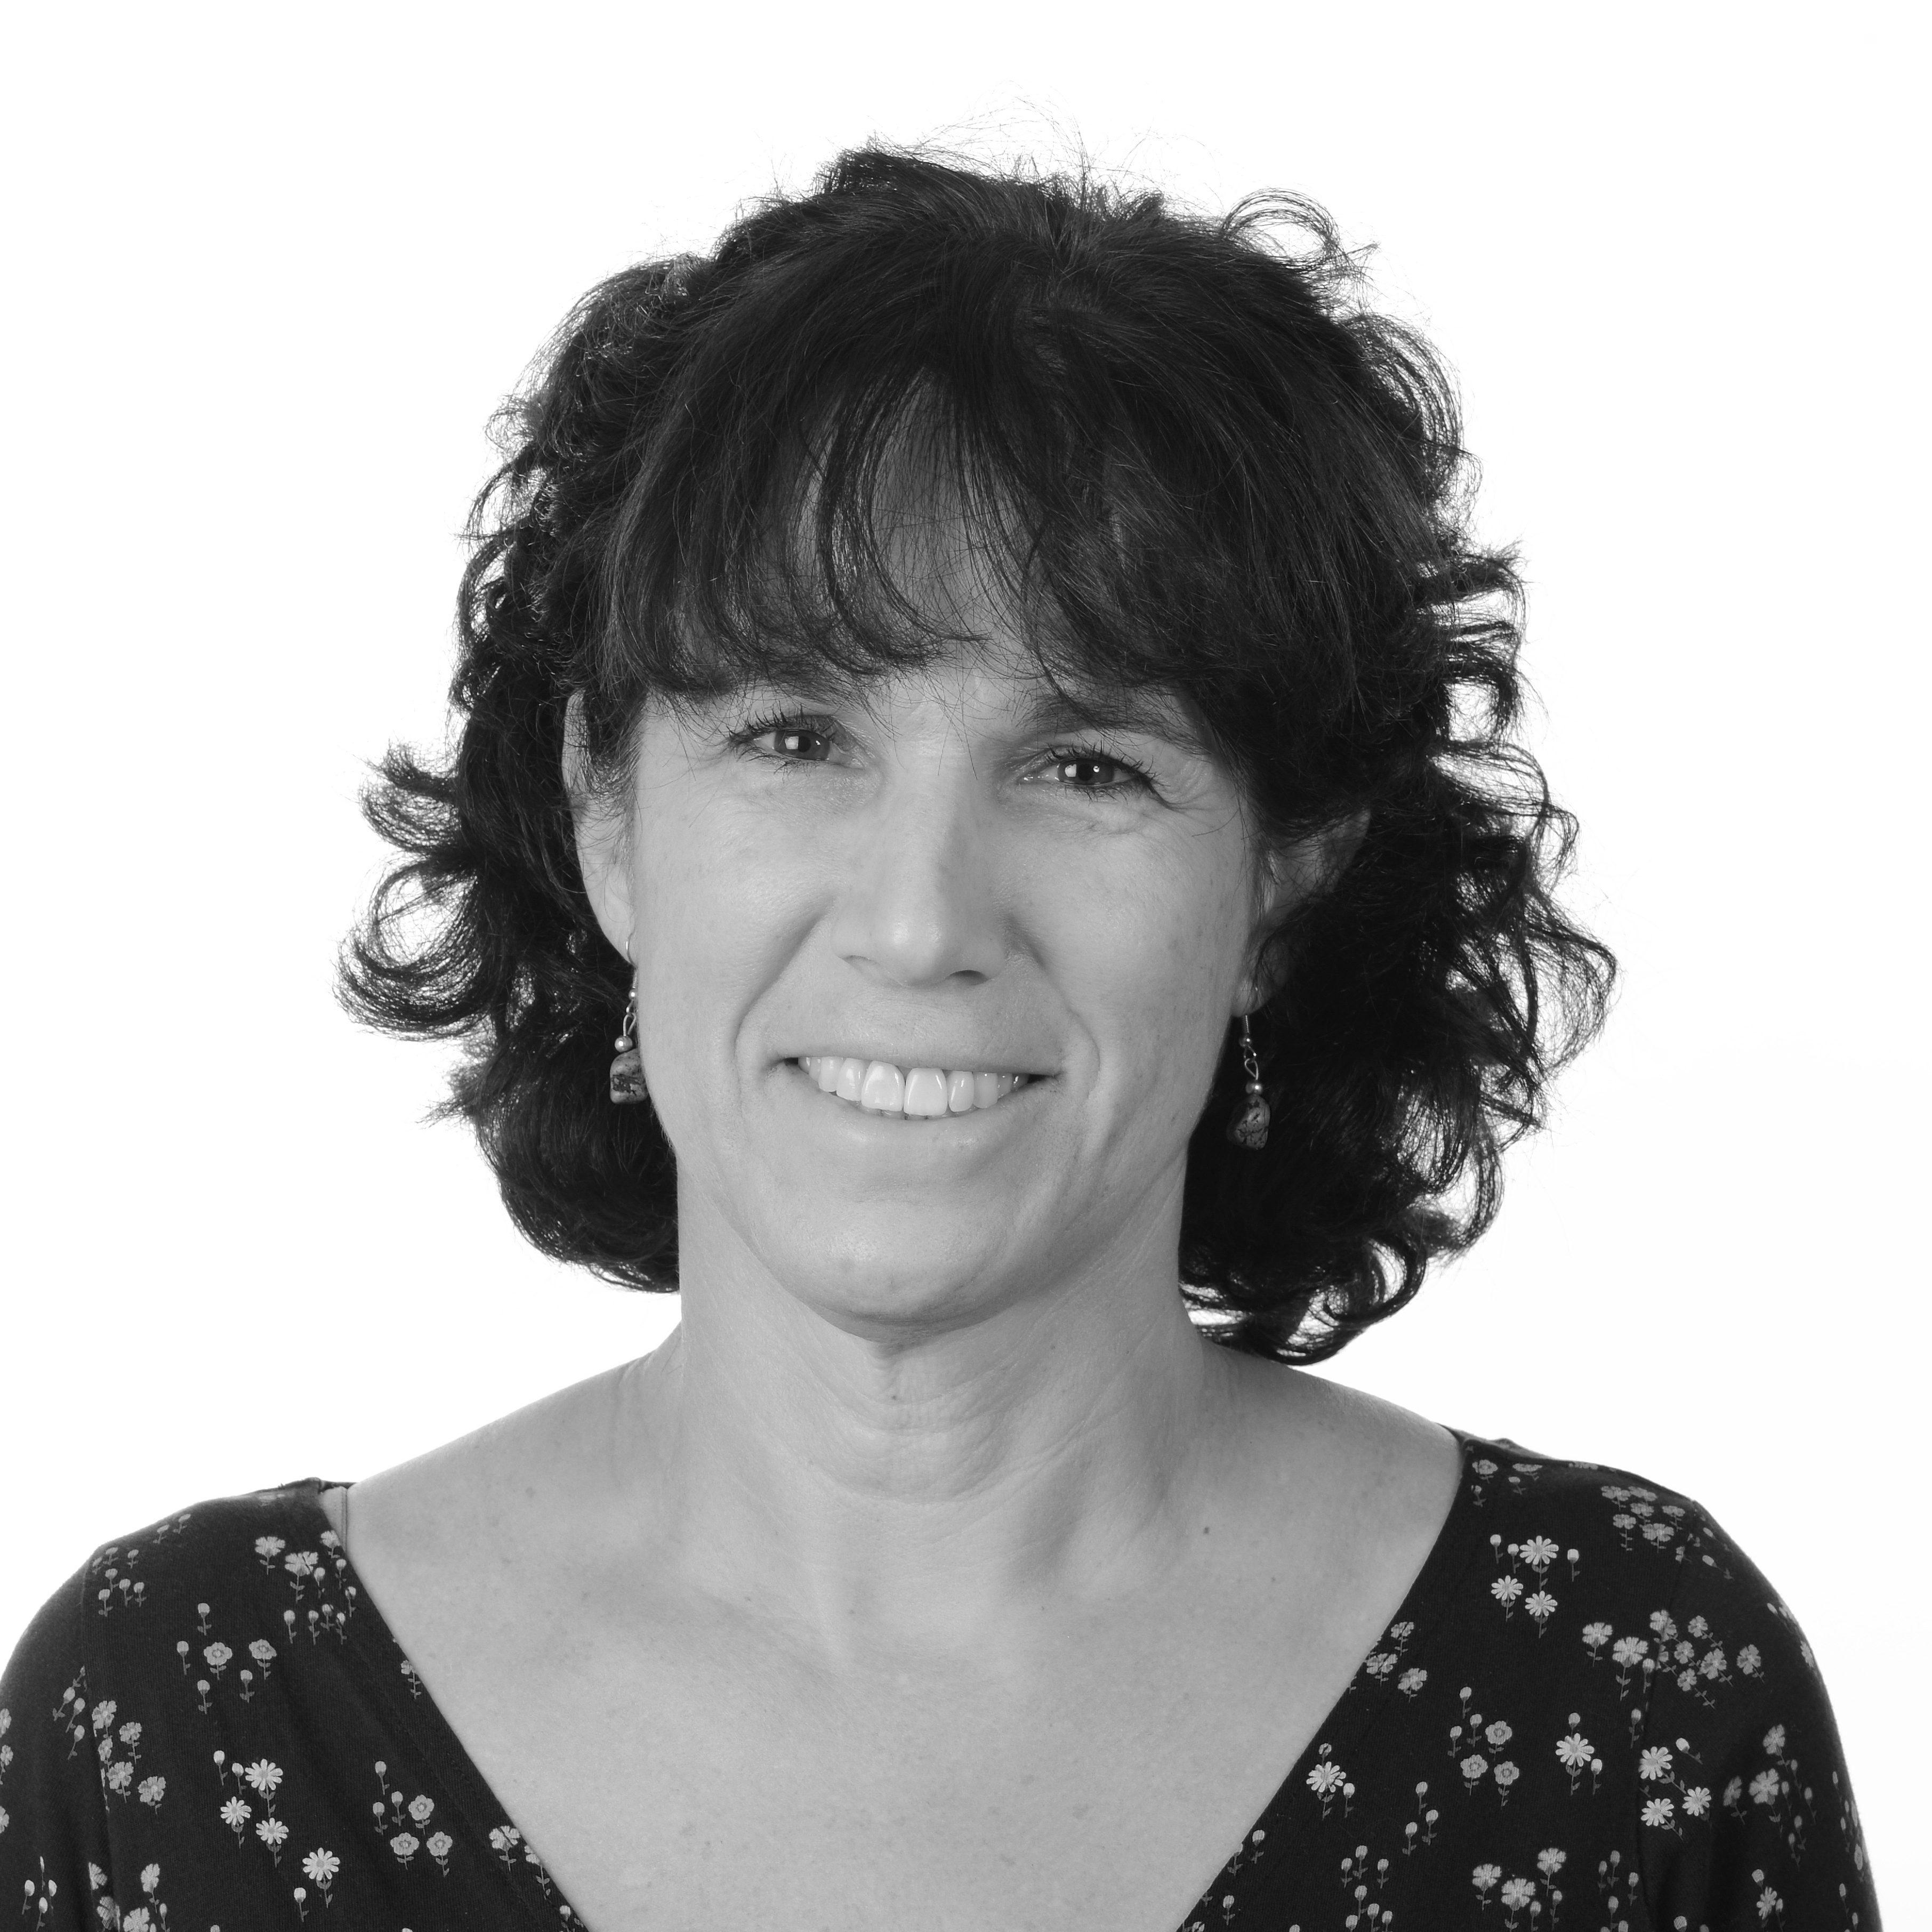 Michelle Portman